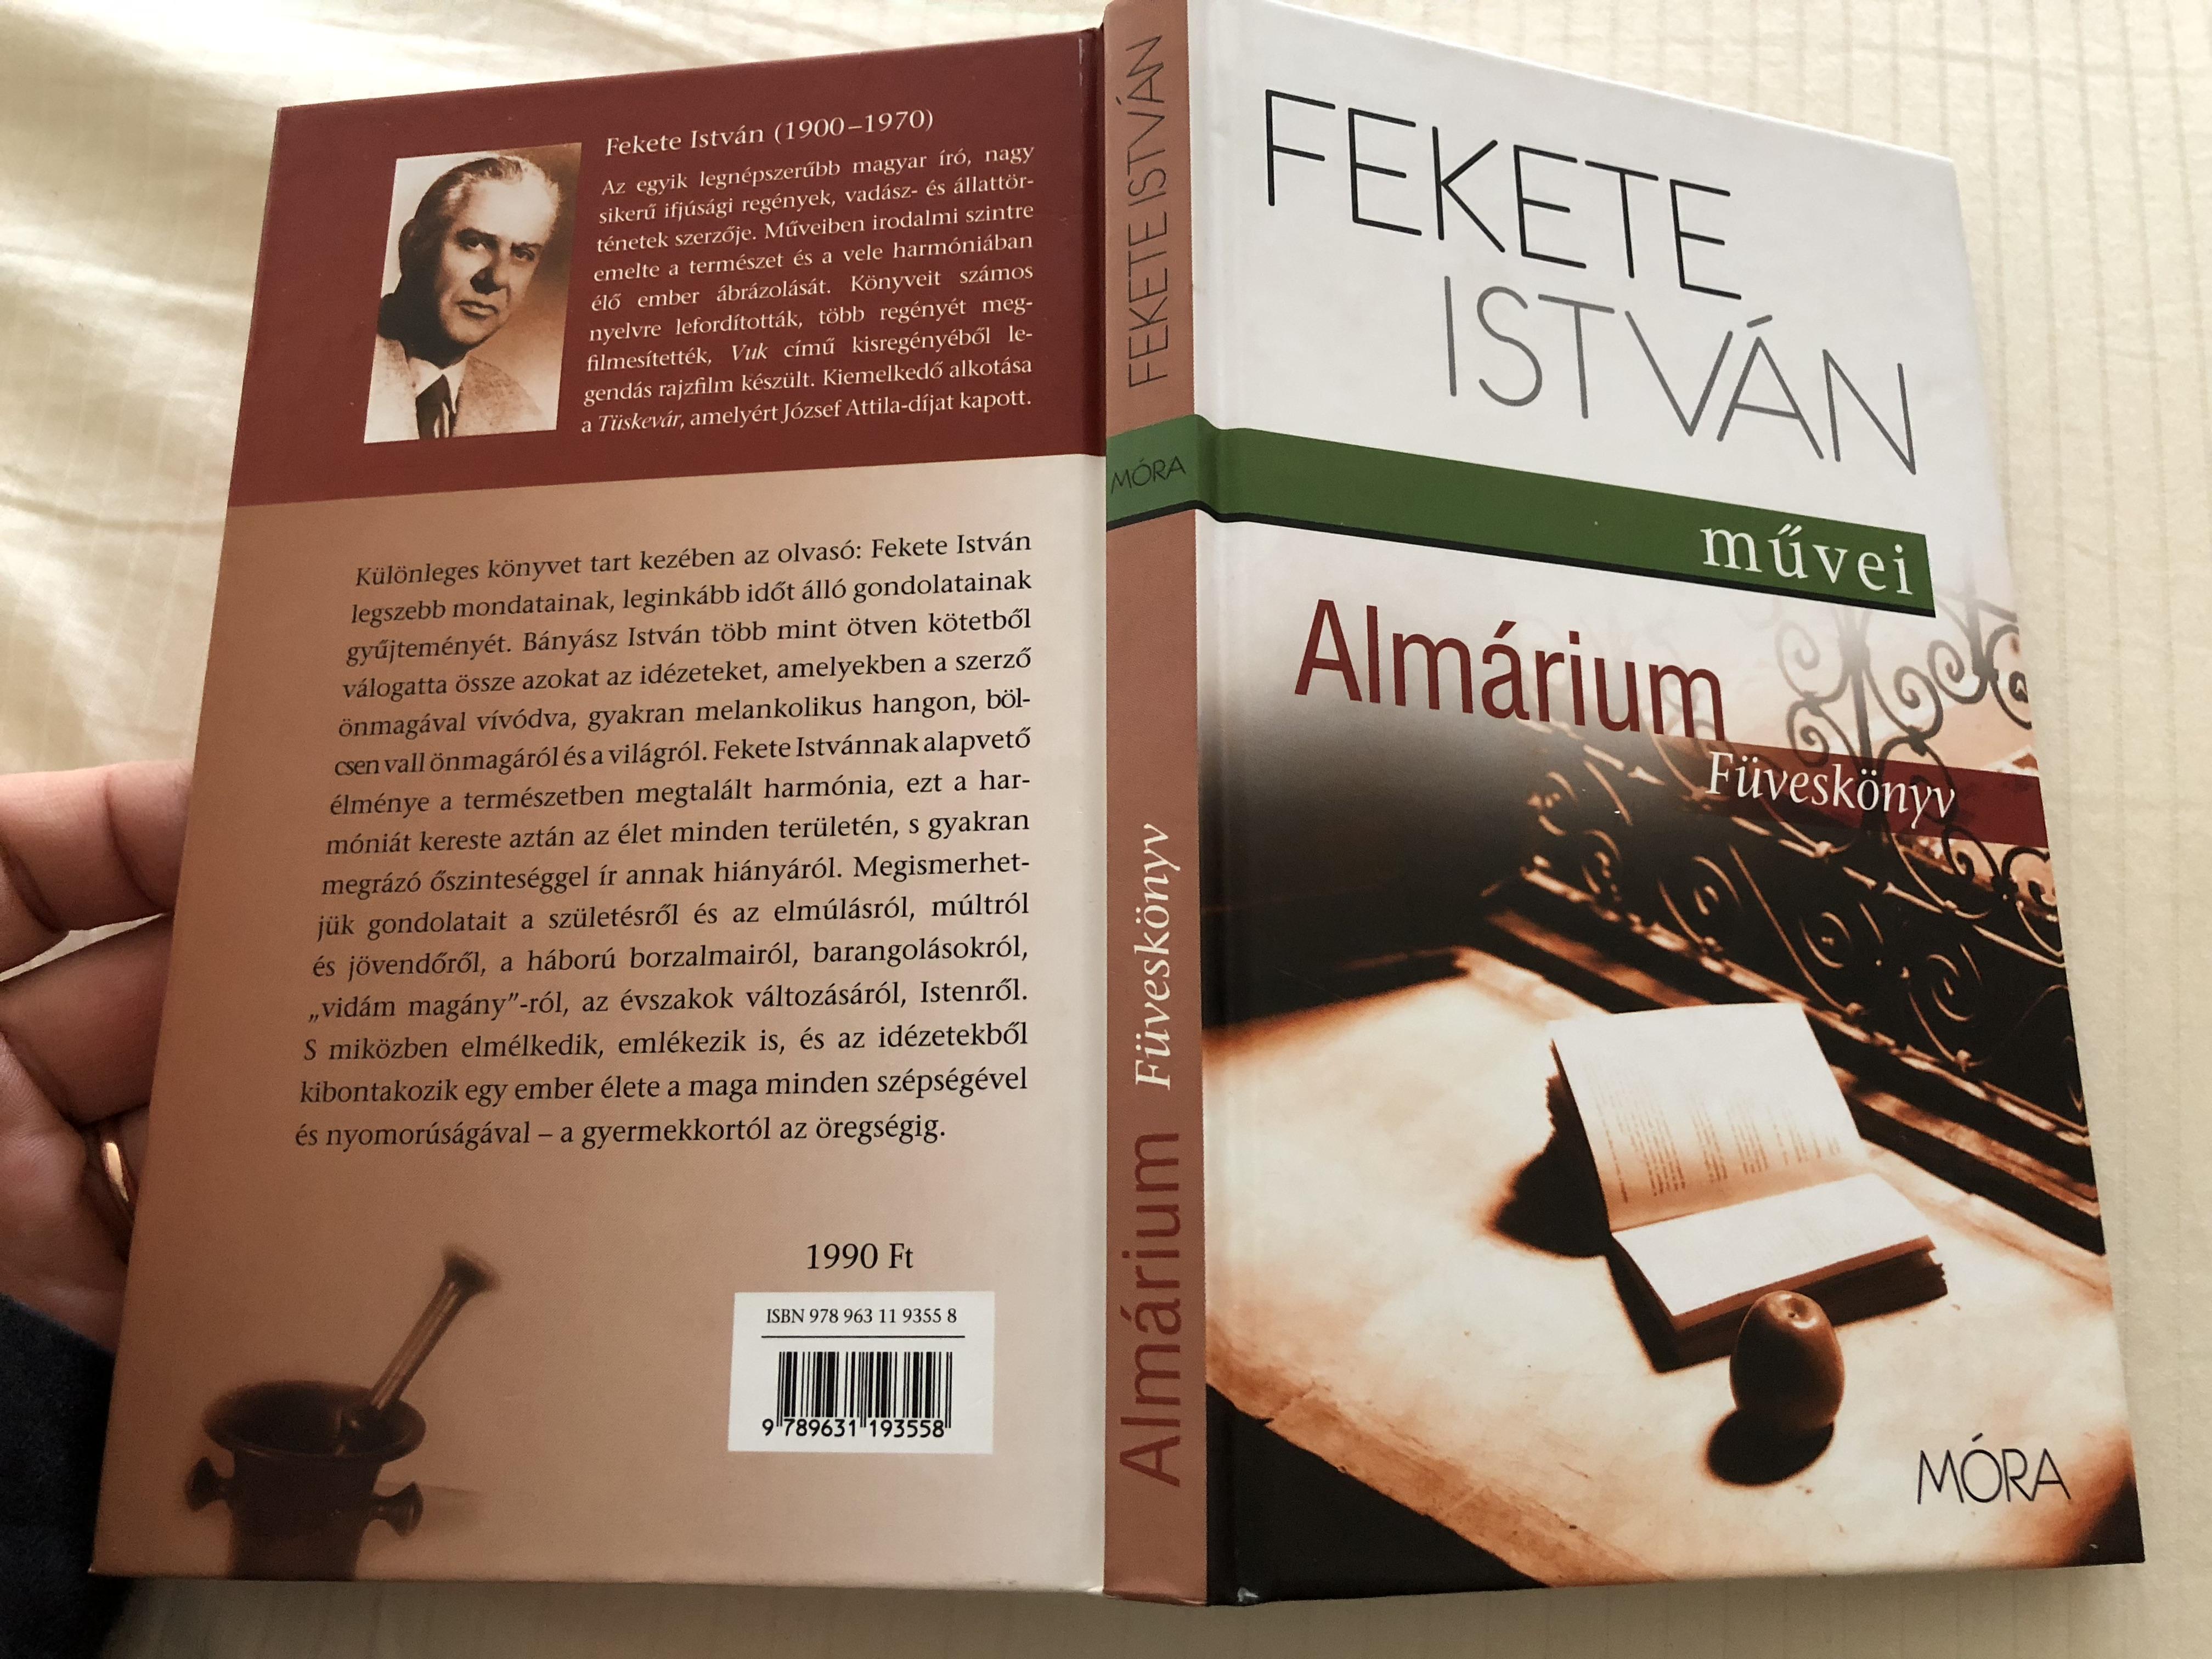 -alm-rium-f-vesk-nyv-by-fekete-istv-n-illustrations-by-vid-gy-z-m-ra-k-nyvkiad-2012-paperback-11-.jpg